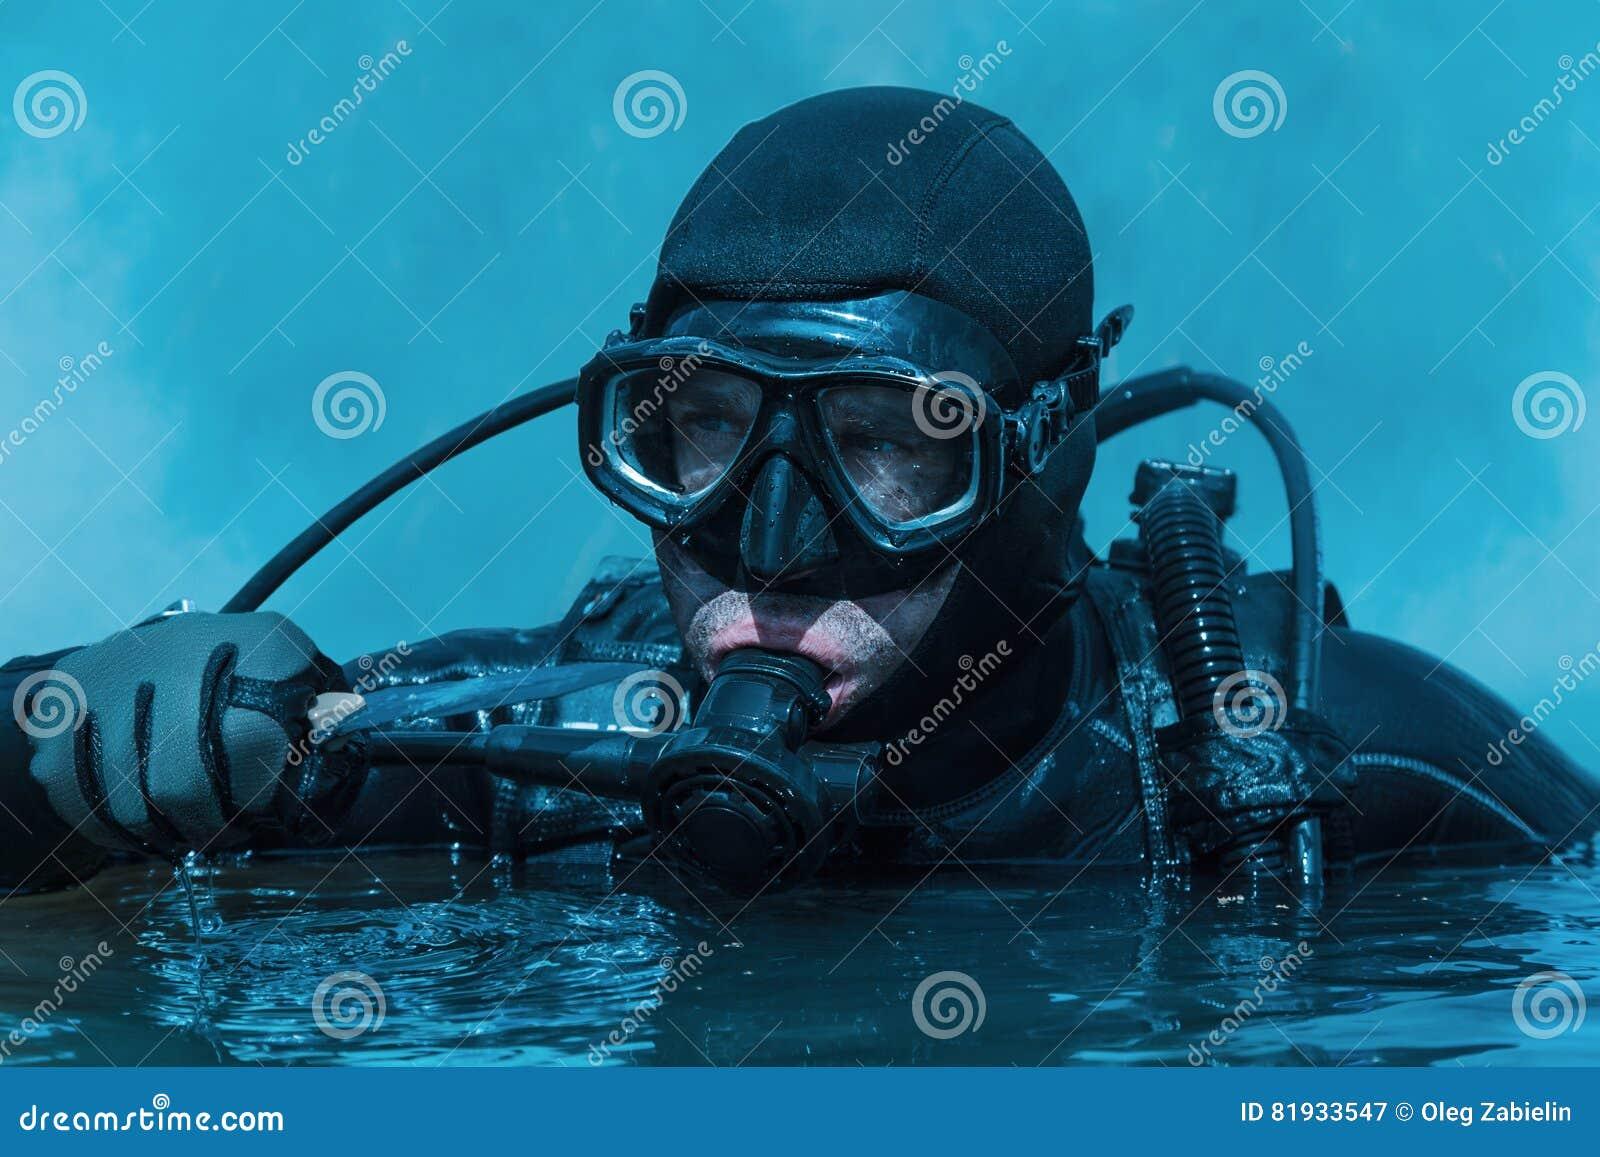 Navy seal frogman stock image image of helmet maritime 81933547 - Navy seal dive gear ...